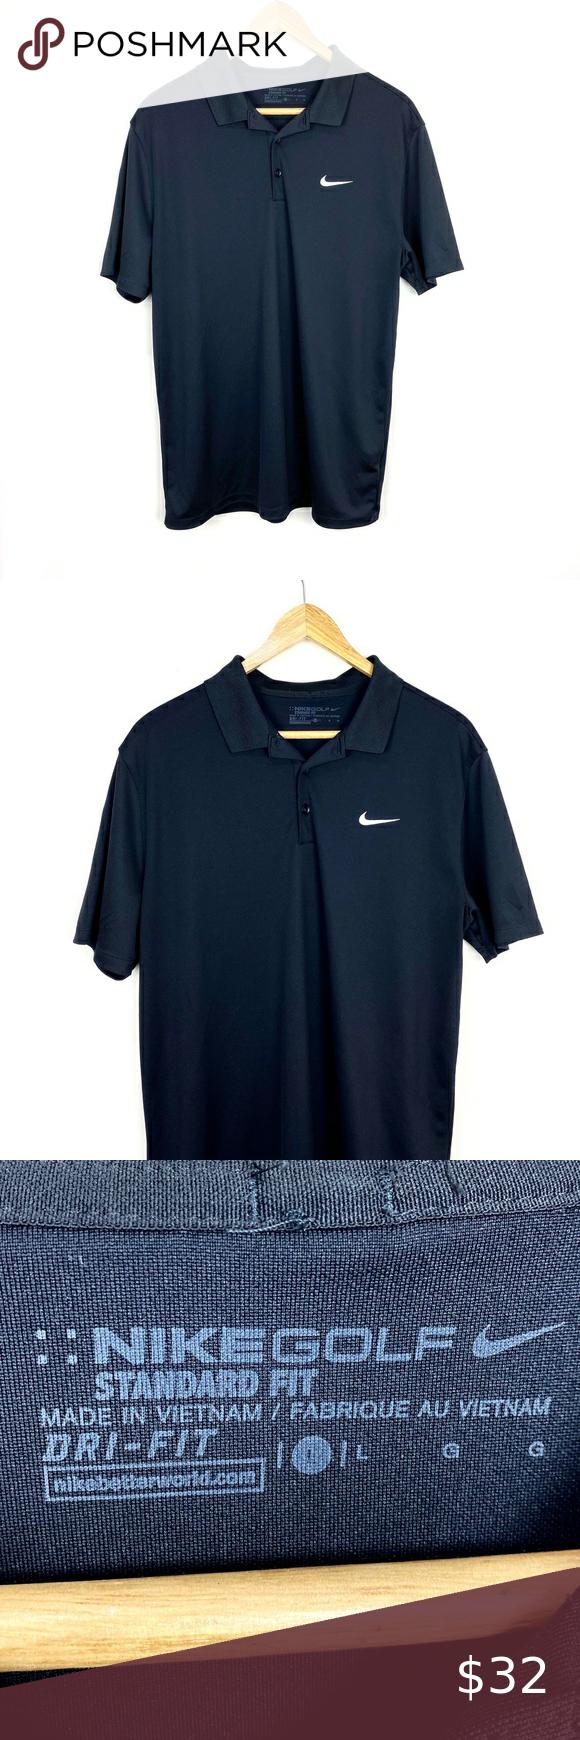 Men S Nike Black Polo Shirt Dri Fit Size L Black Polo Shirt Black Nikes Dri Fit